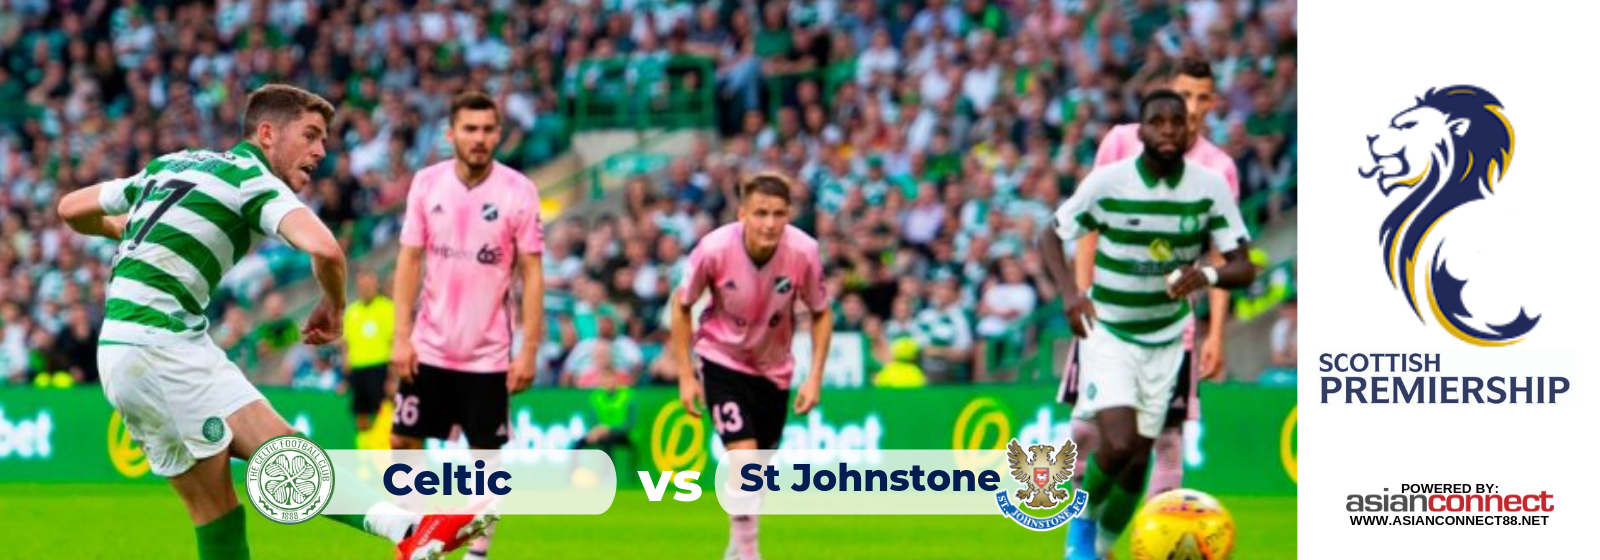 Scottish Premiereship Celtic Vs. St Johnstone Asian Connect